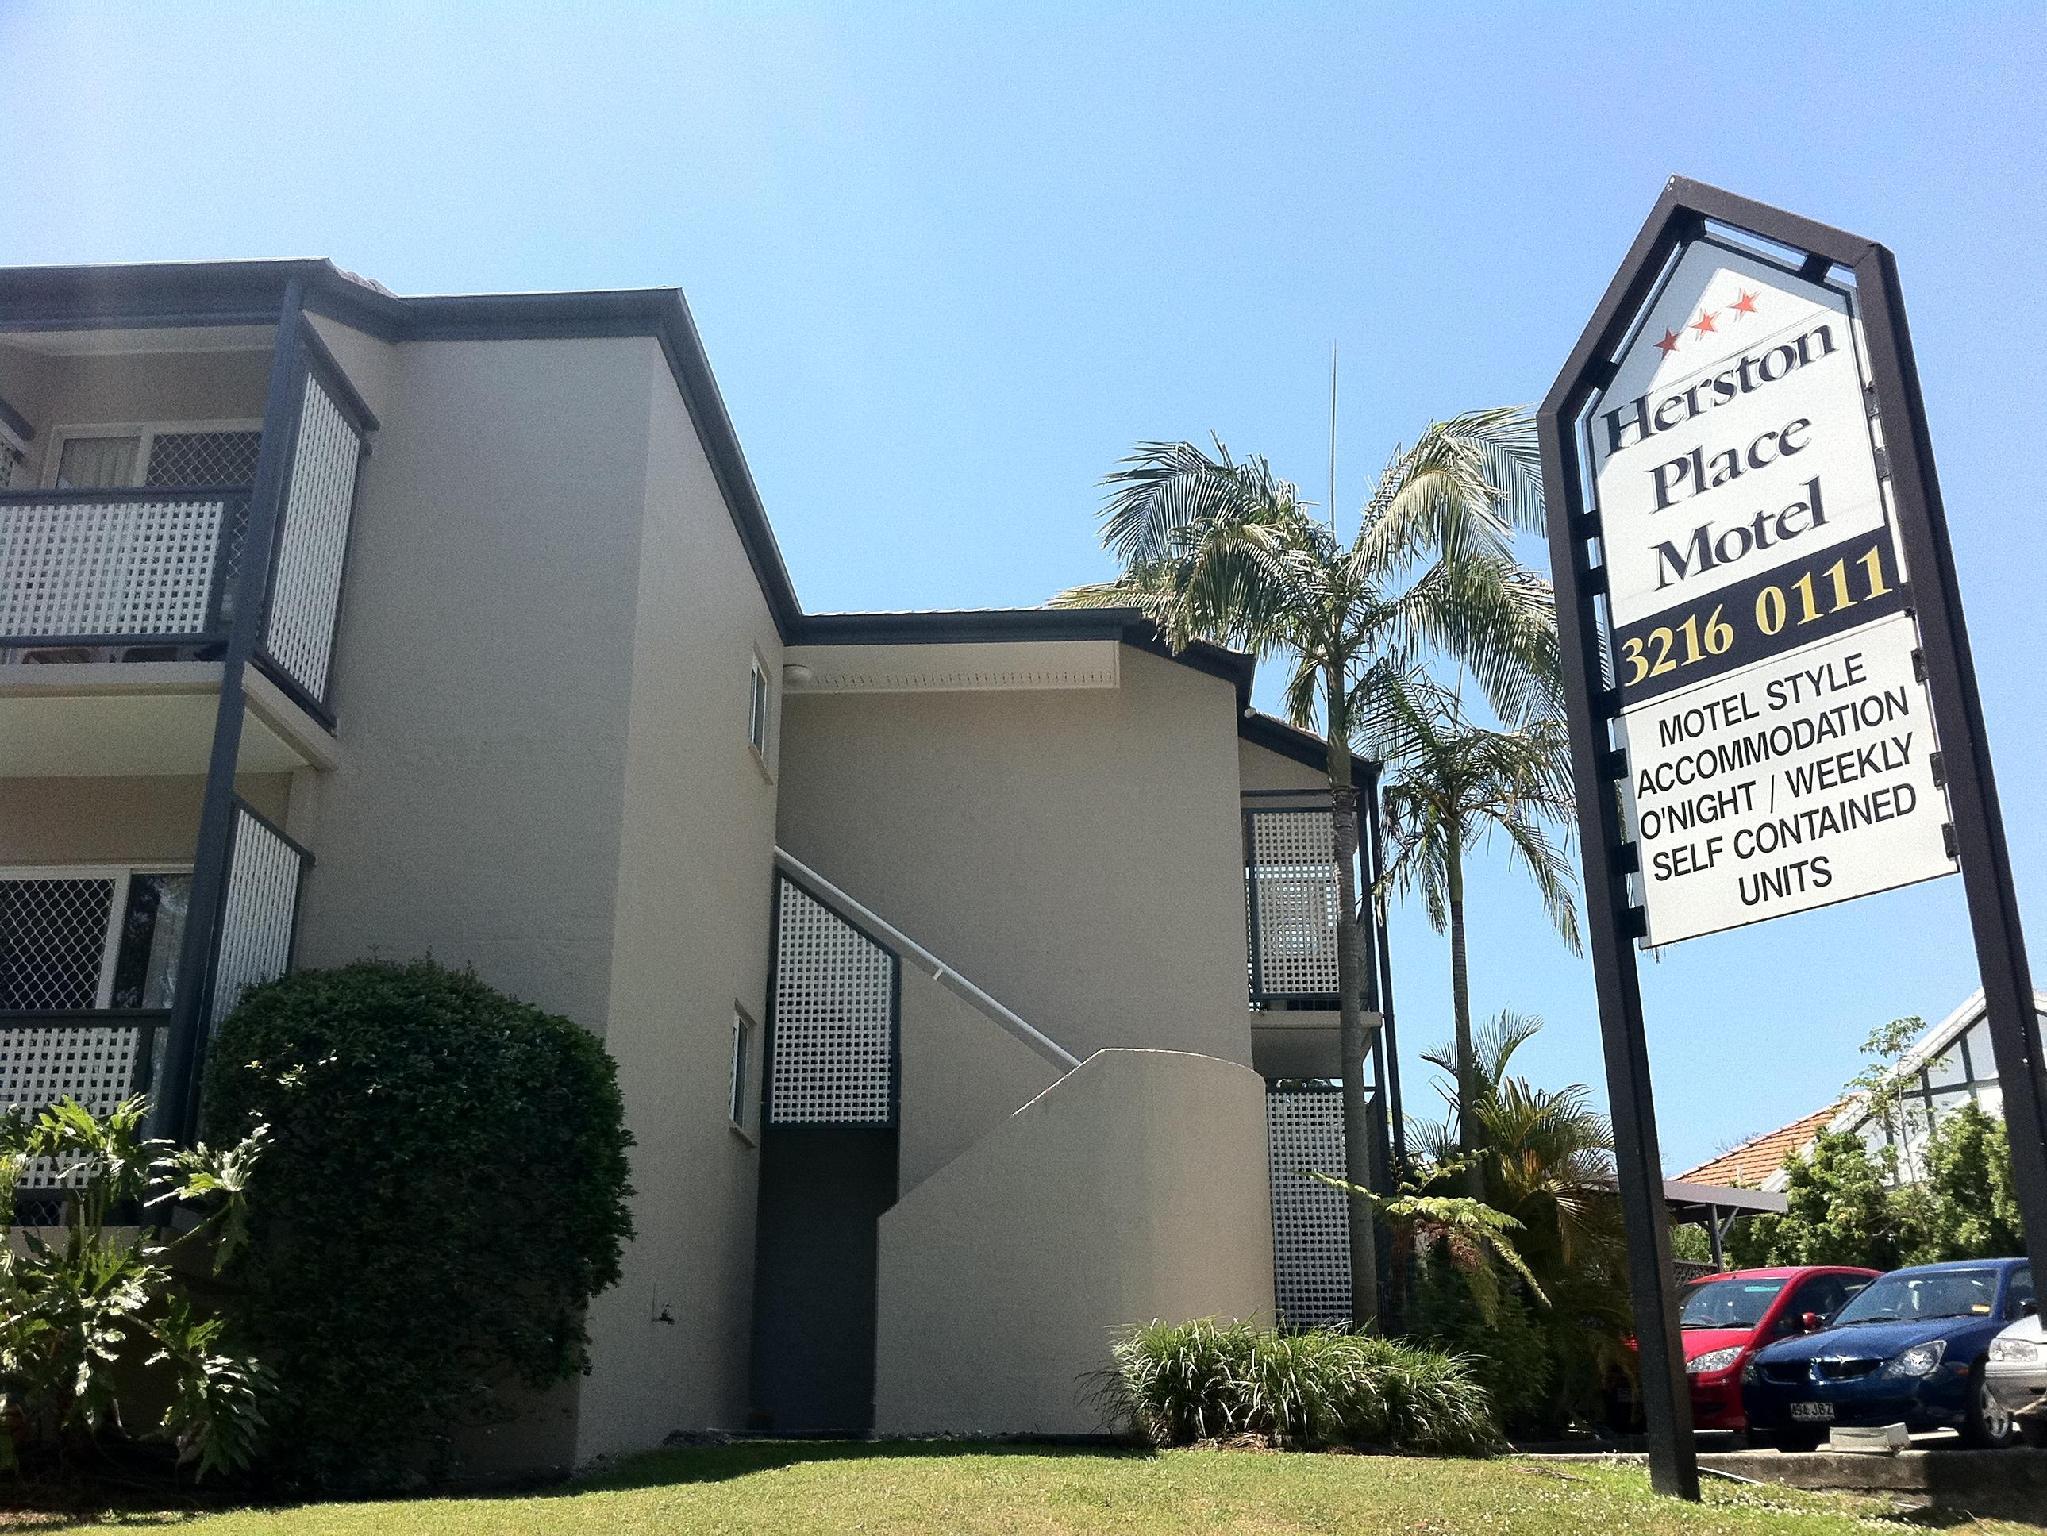 Herston Place Motel - Hotell och Boende i Australien , Brisbane